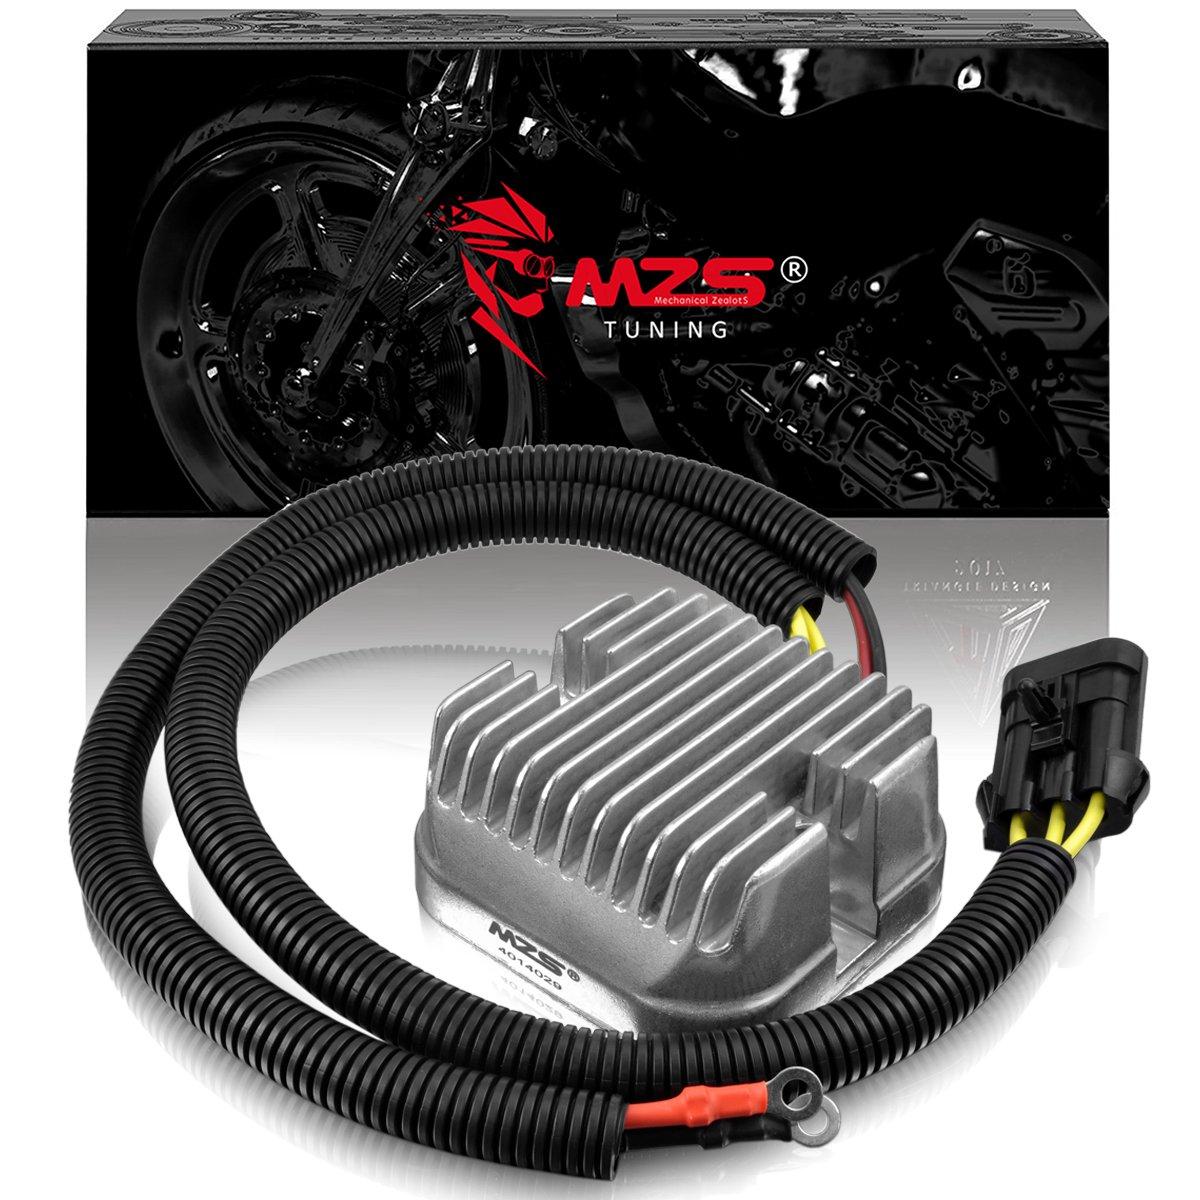 MZS Voltage Regulator Rectifier for Polaris 4014029 4015229 4013247 4013904